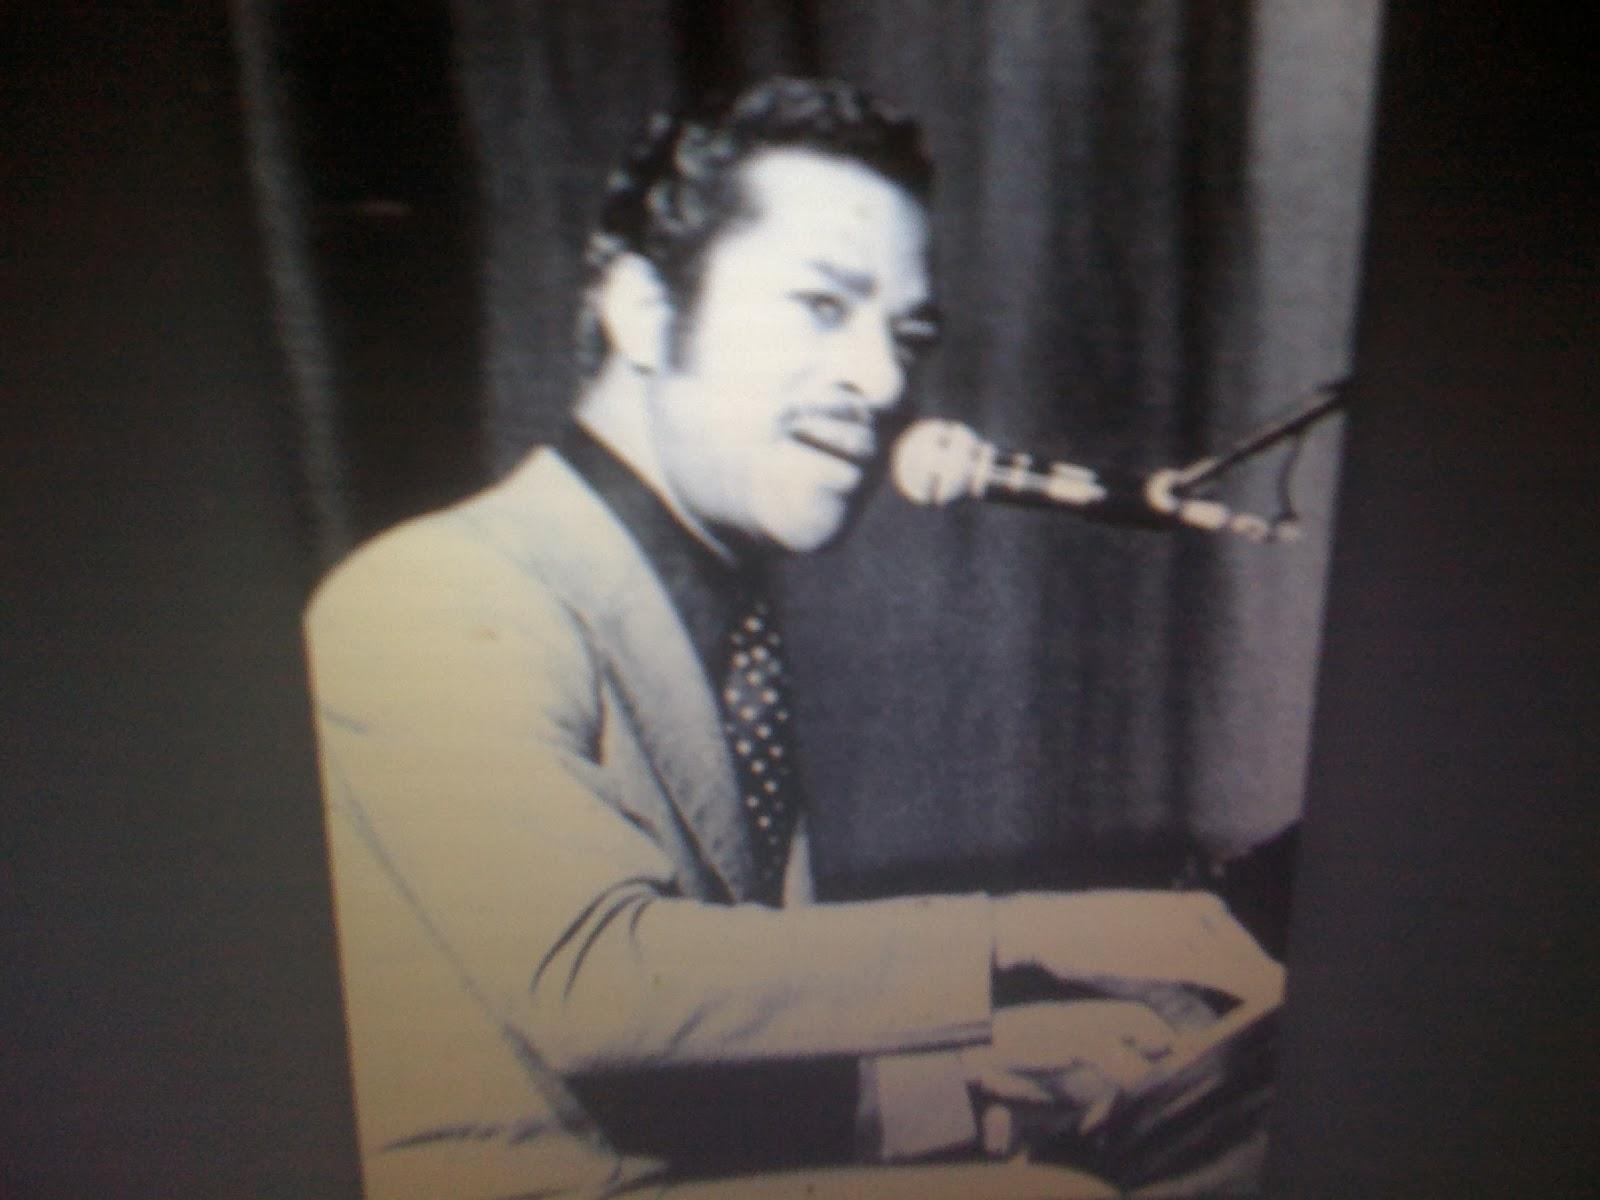 Willie Mabon - Poison Ivy - Say Man